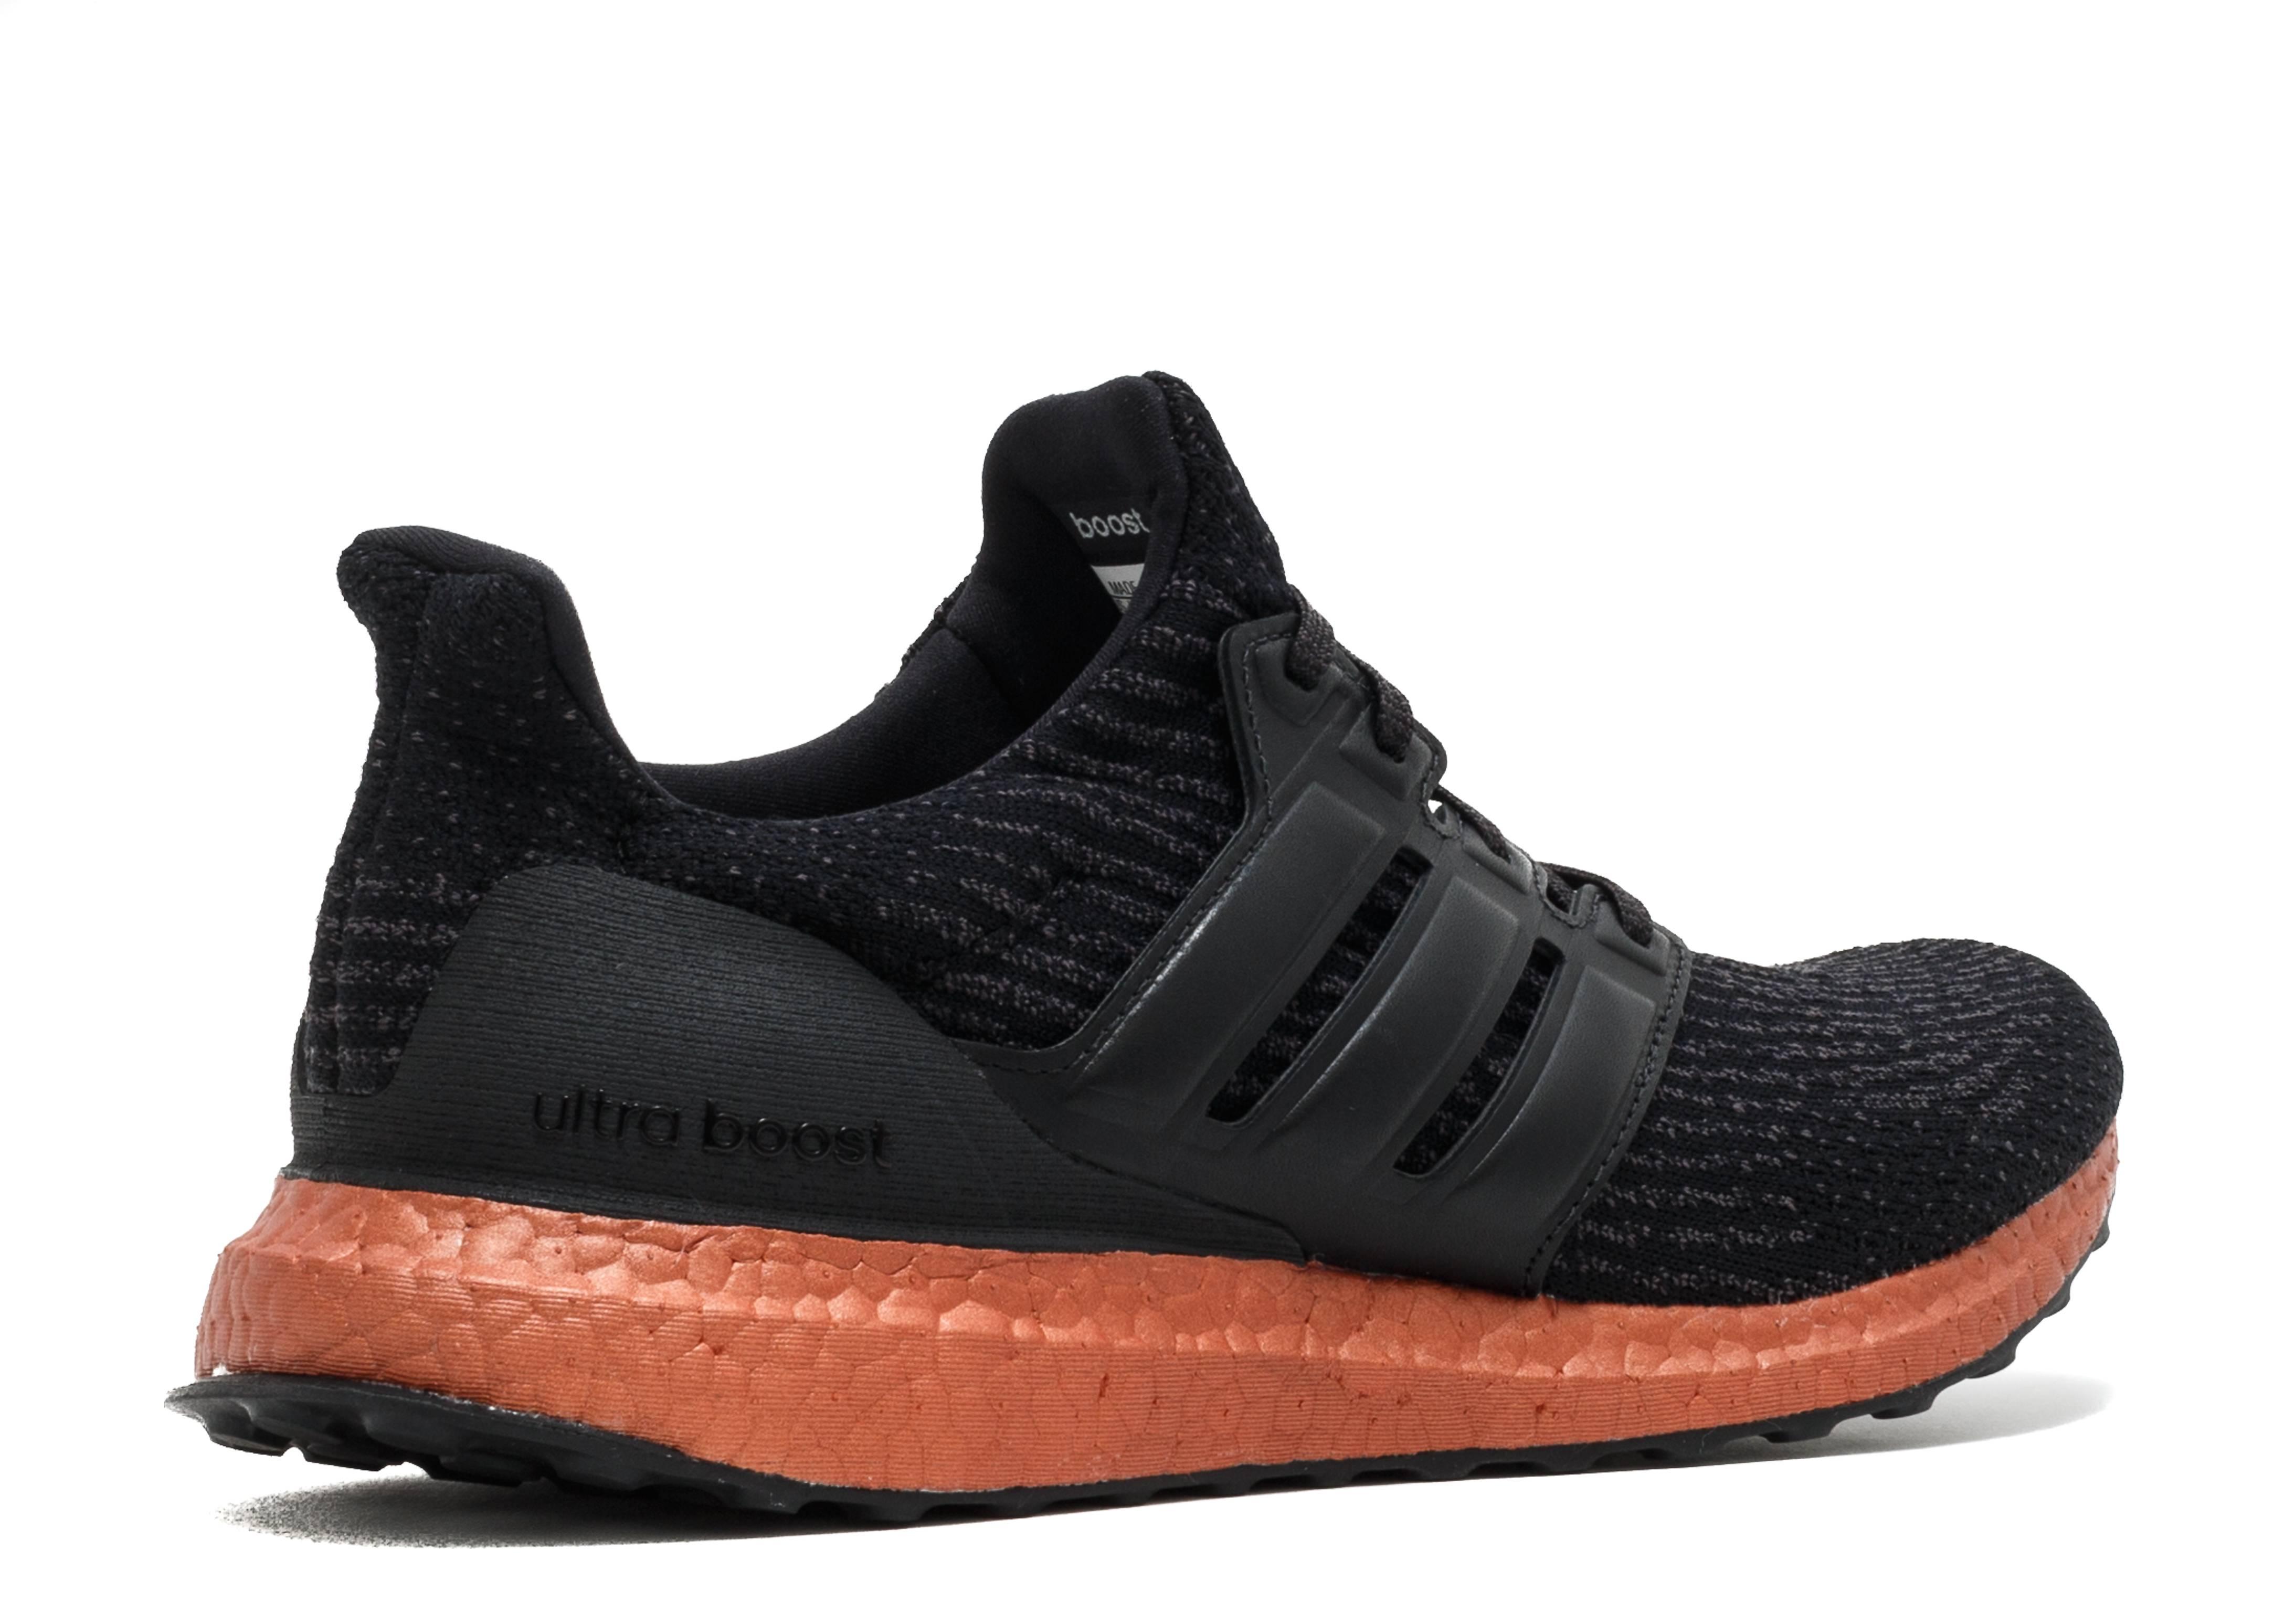 abcb7cb61d61a Ultra Boost - Adidas - cg4086 - black bronze